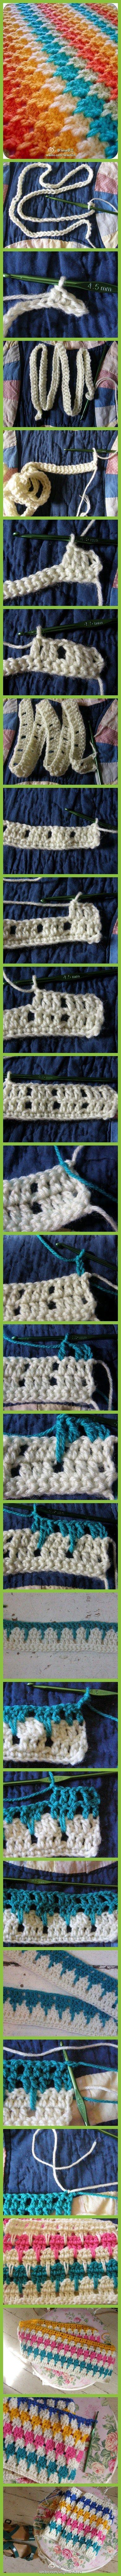 Great Photo Tutorial Larksfoot Crochet Projects Patterns